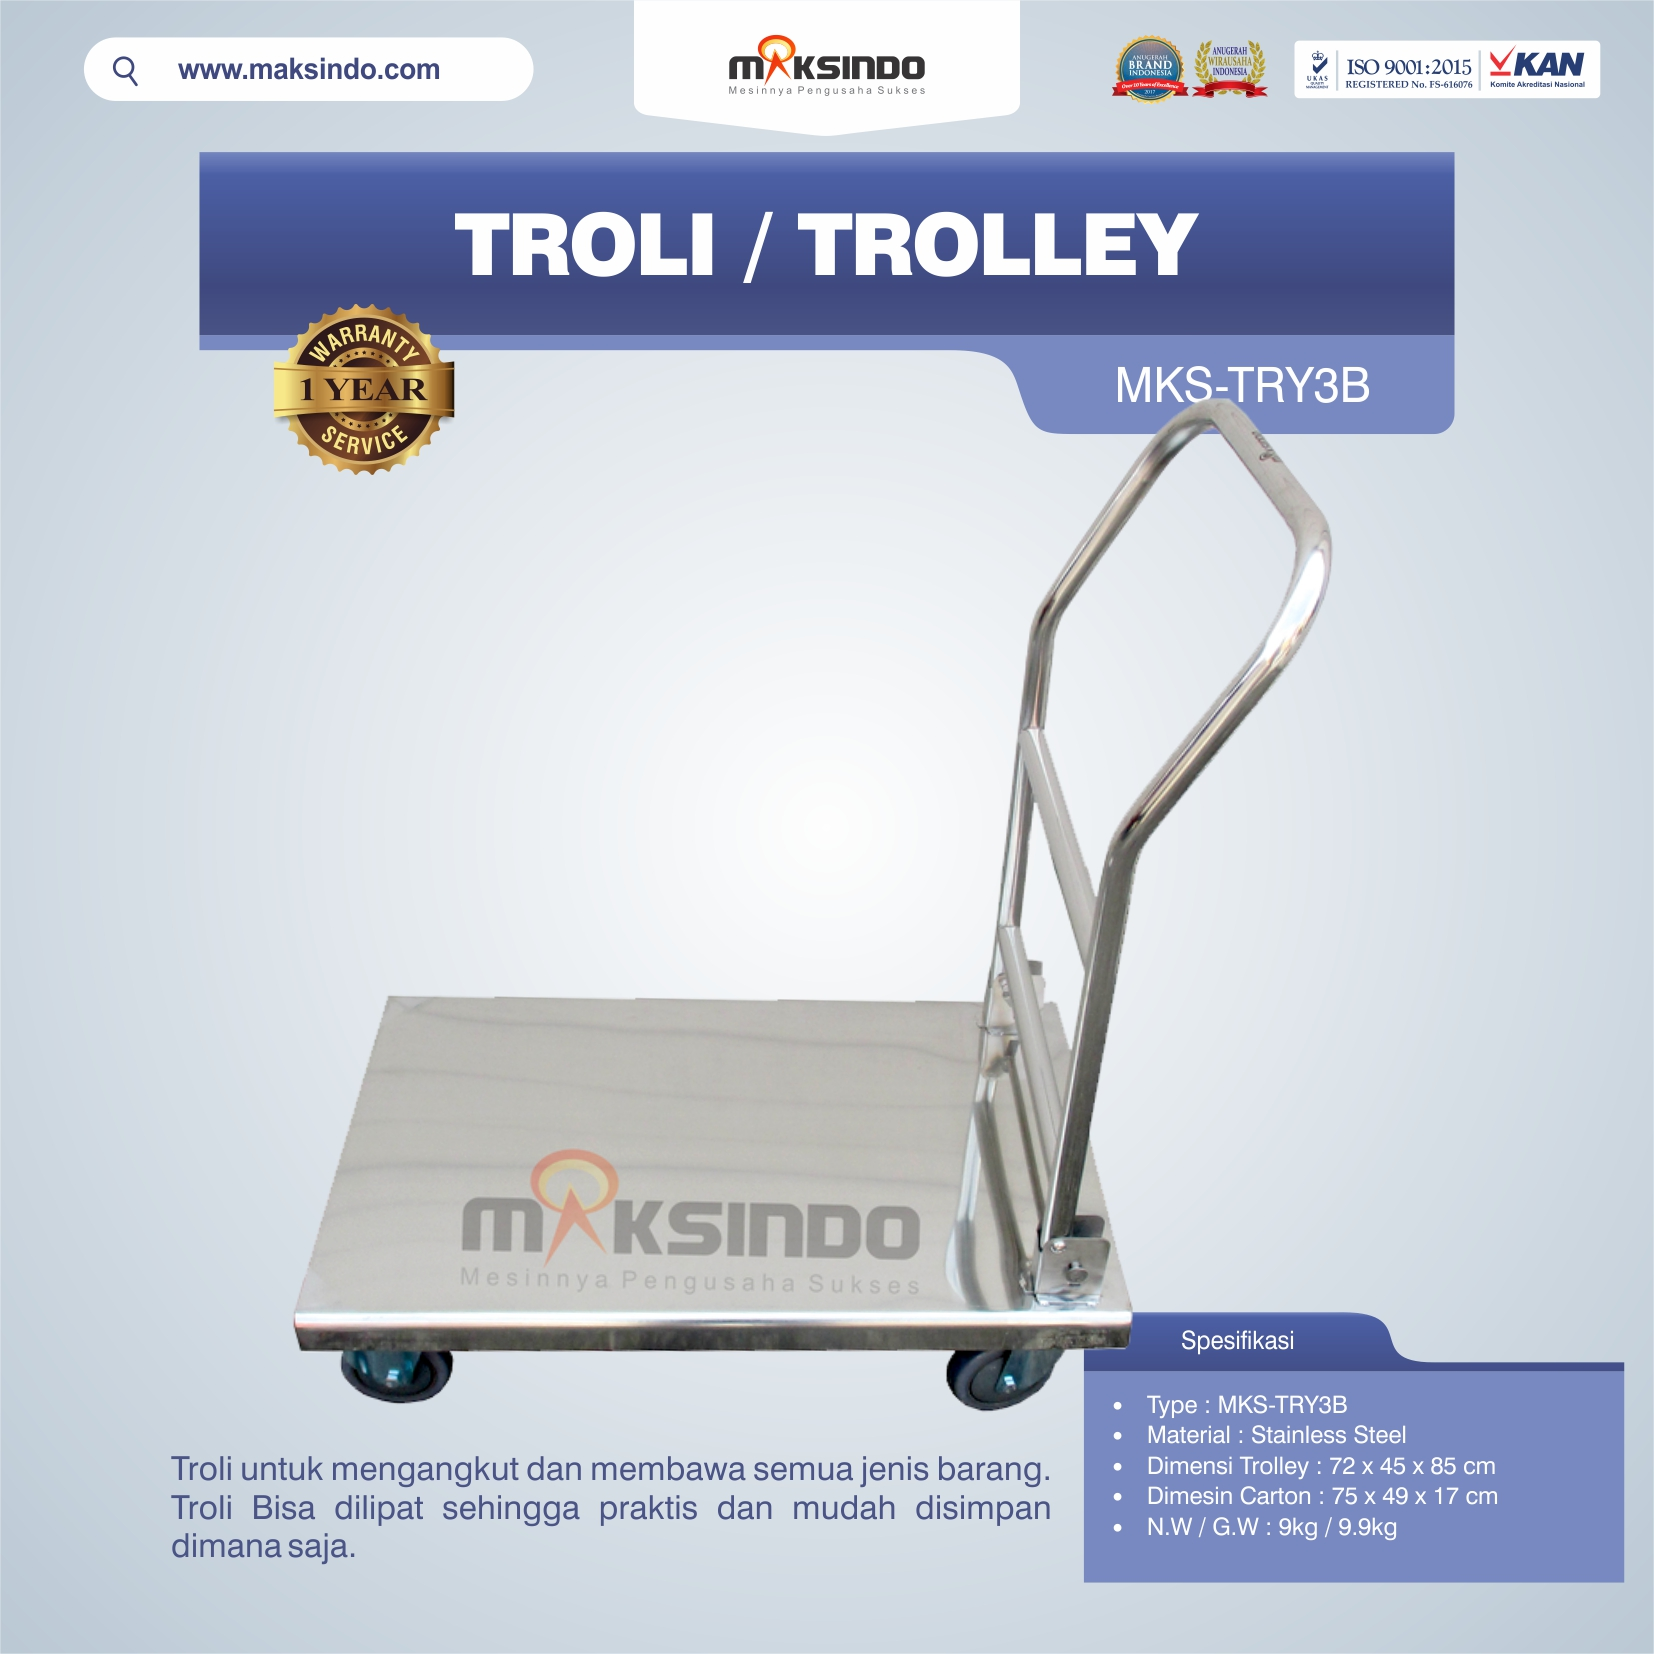 Jual Troli/Trolley MKS-TRY3B di Bali